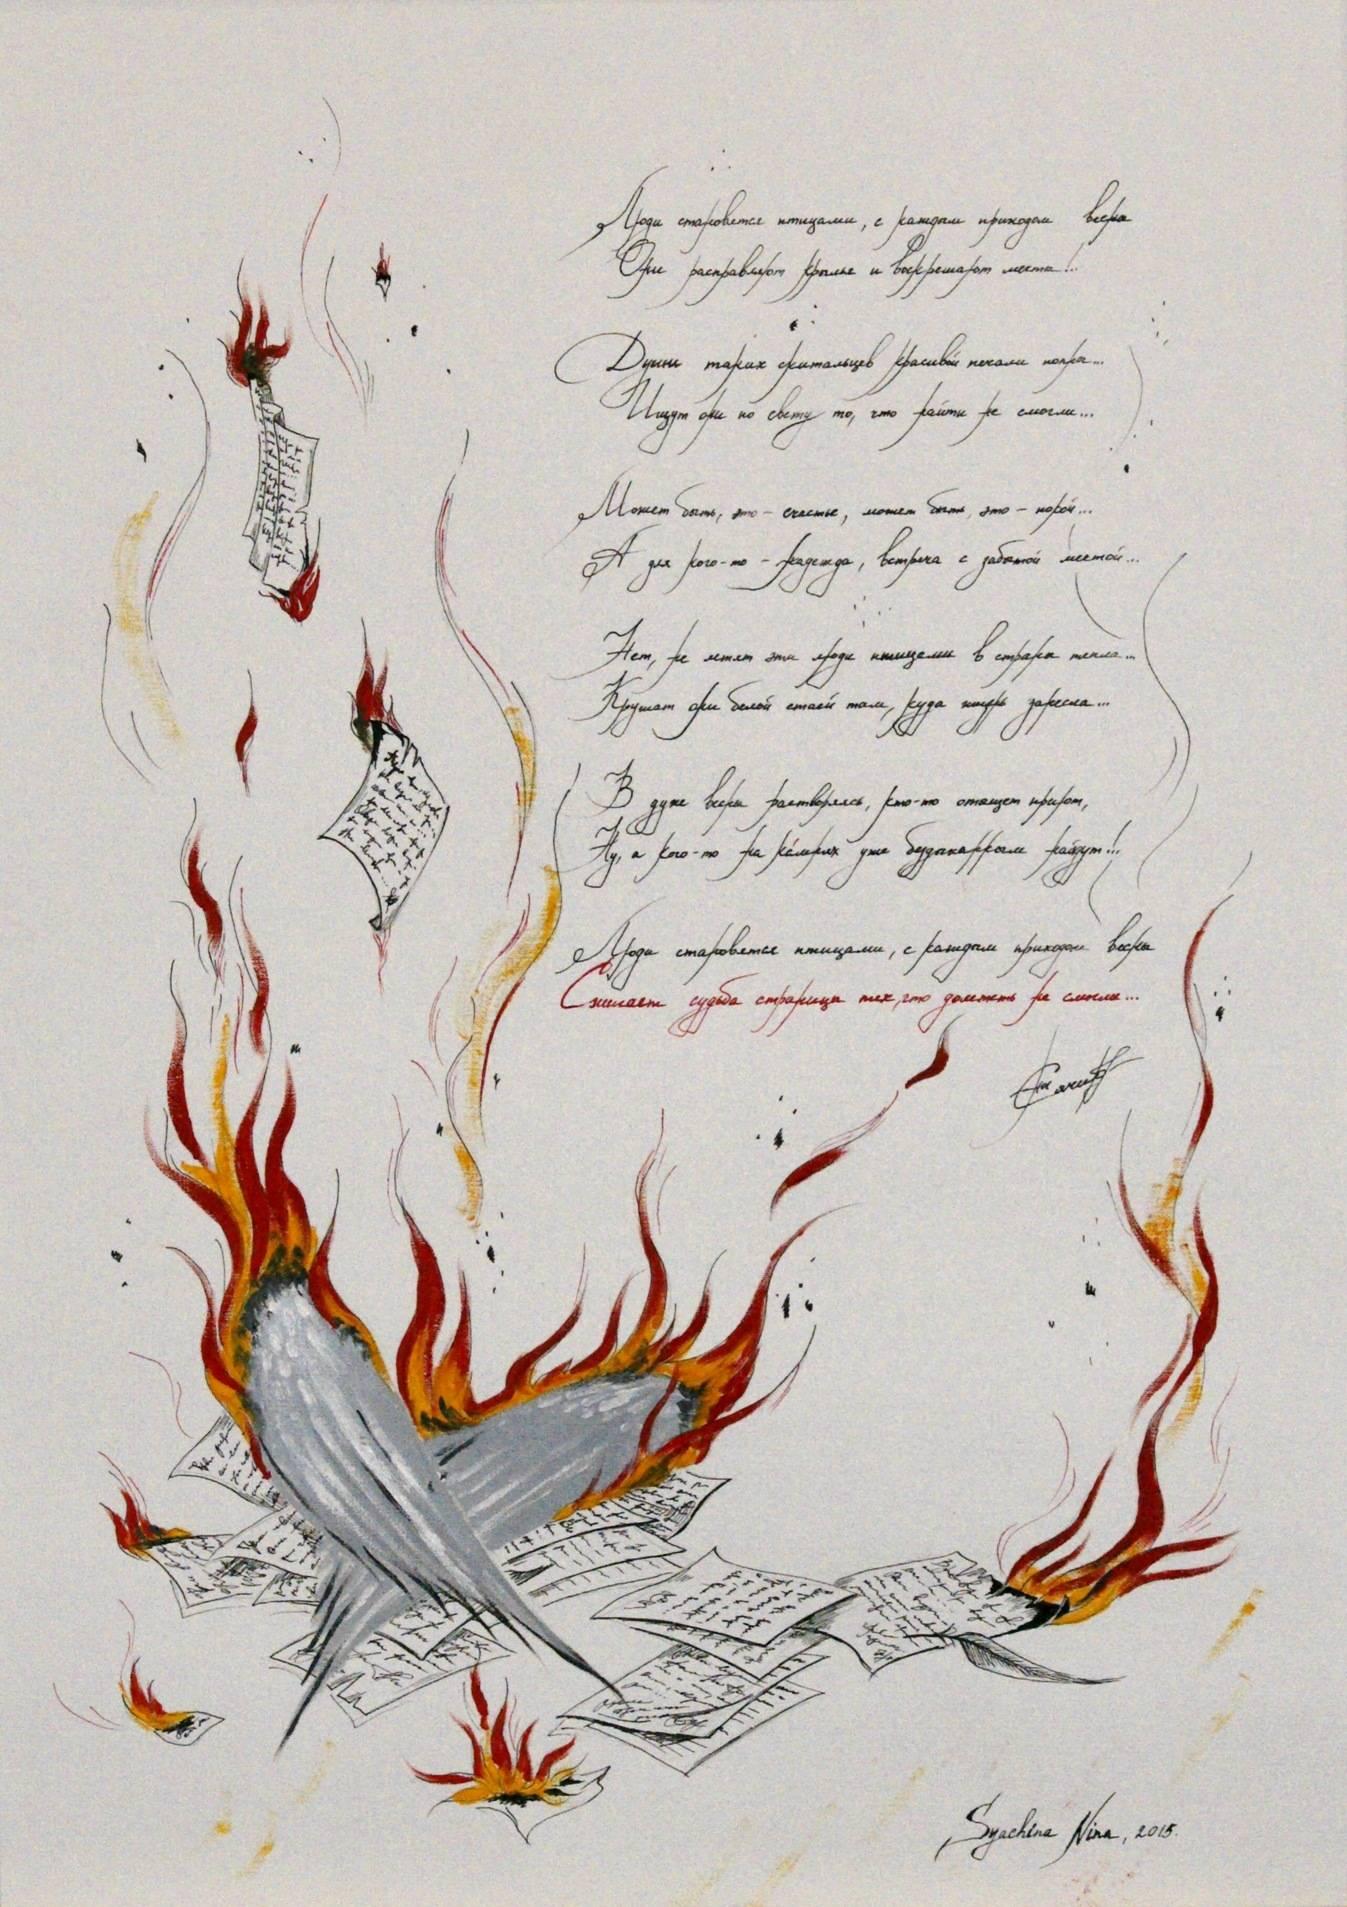 """Костёр Судеб"". ""Ритмика Жизни"". 2015год. Графика, живопись маслом. Масло, бумага, перо, тушь. 42х60 ""Bonfire of Destiny"". ""Rhythm of Life"". 2015. graphics, painting oil. ink, pen, oil, paper. 50x60"